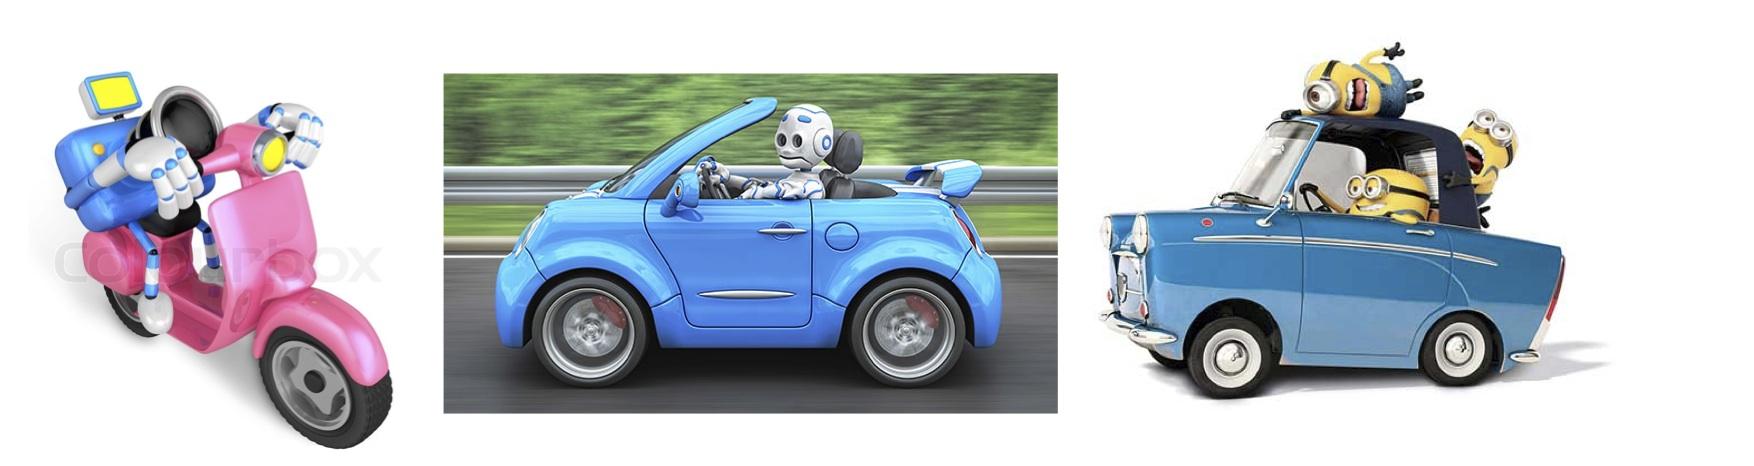 CSC 2541: Visual Perception for Autonomous Driving